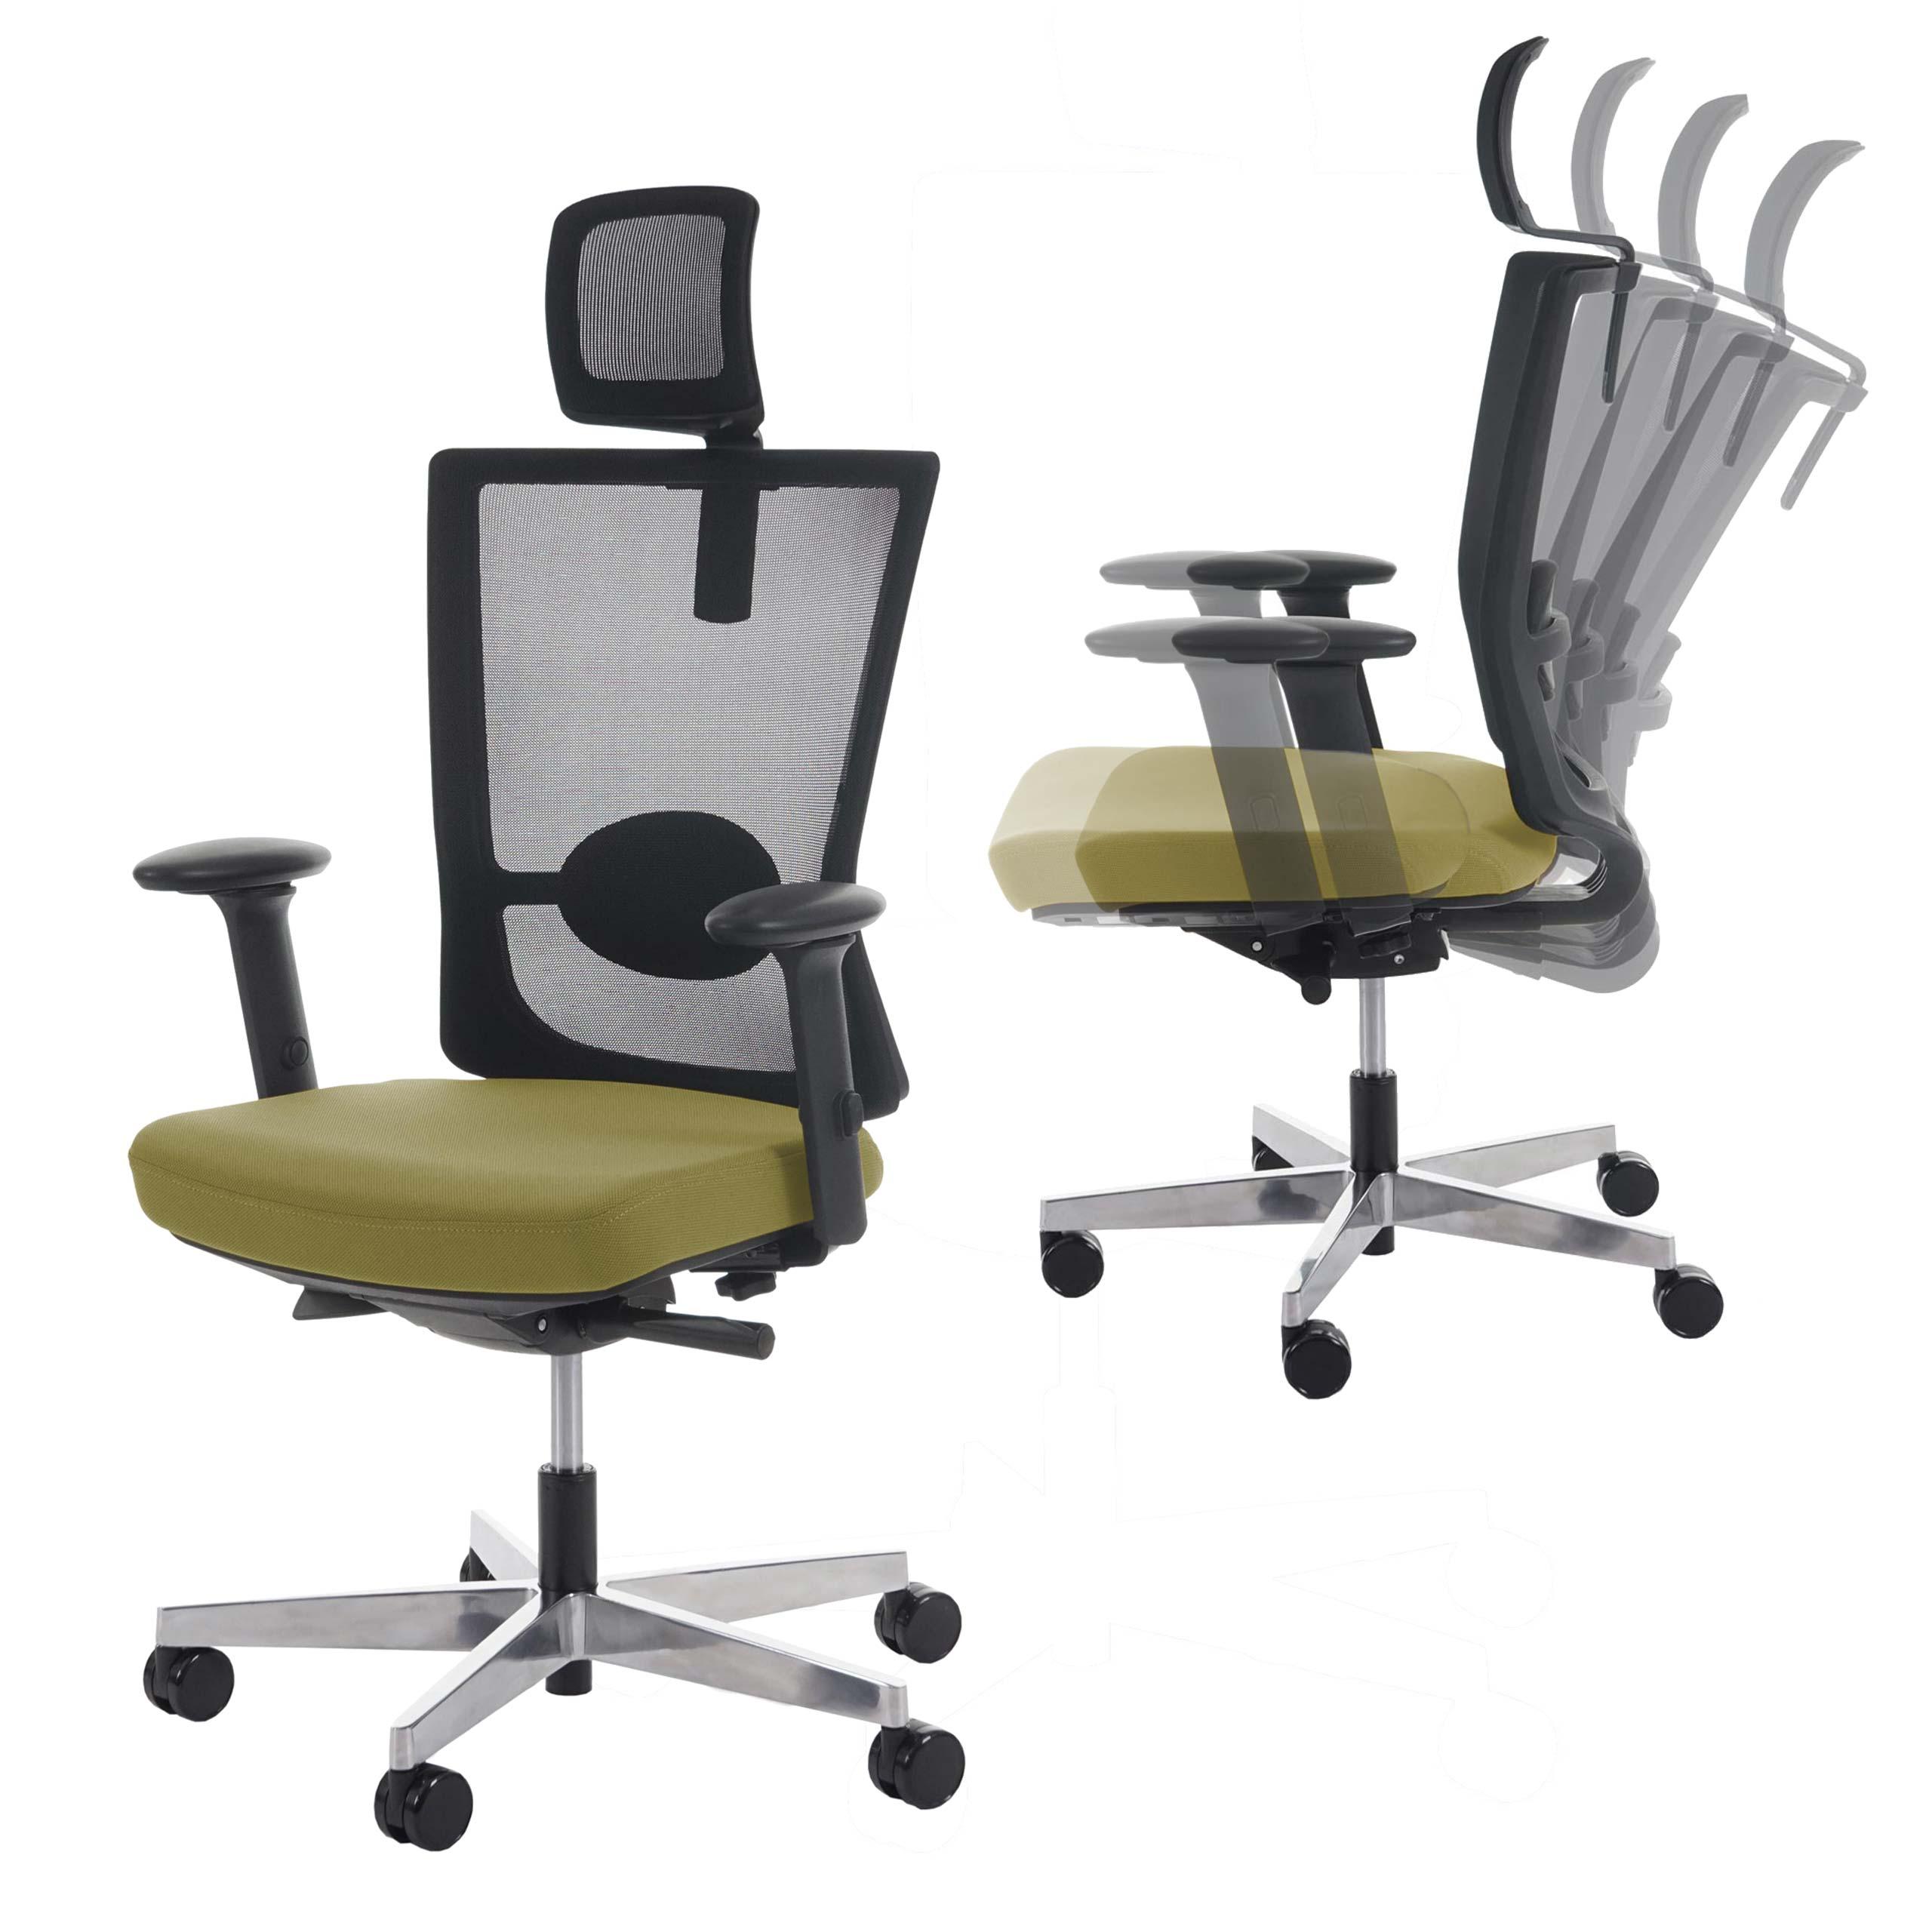 Ergonomischer bürostuhl weiß  Bürostuhl MERRYFAIR Adelaide, Schreibtischstuhl Drehstuhl, Polster ...